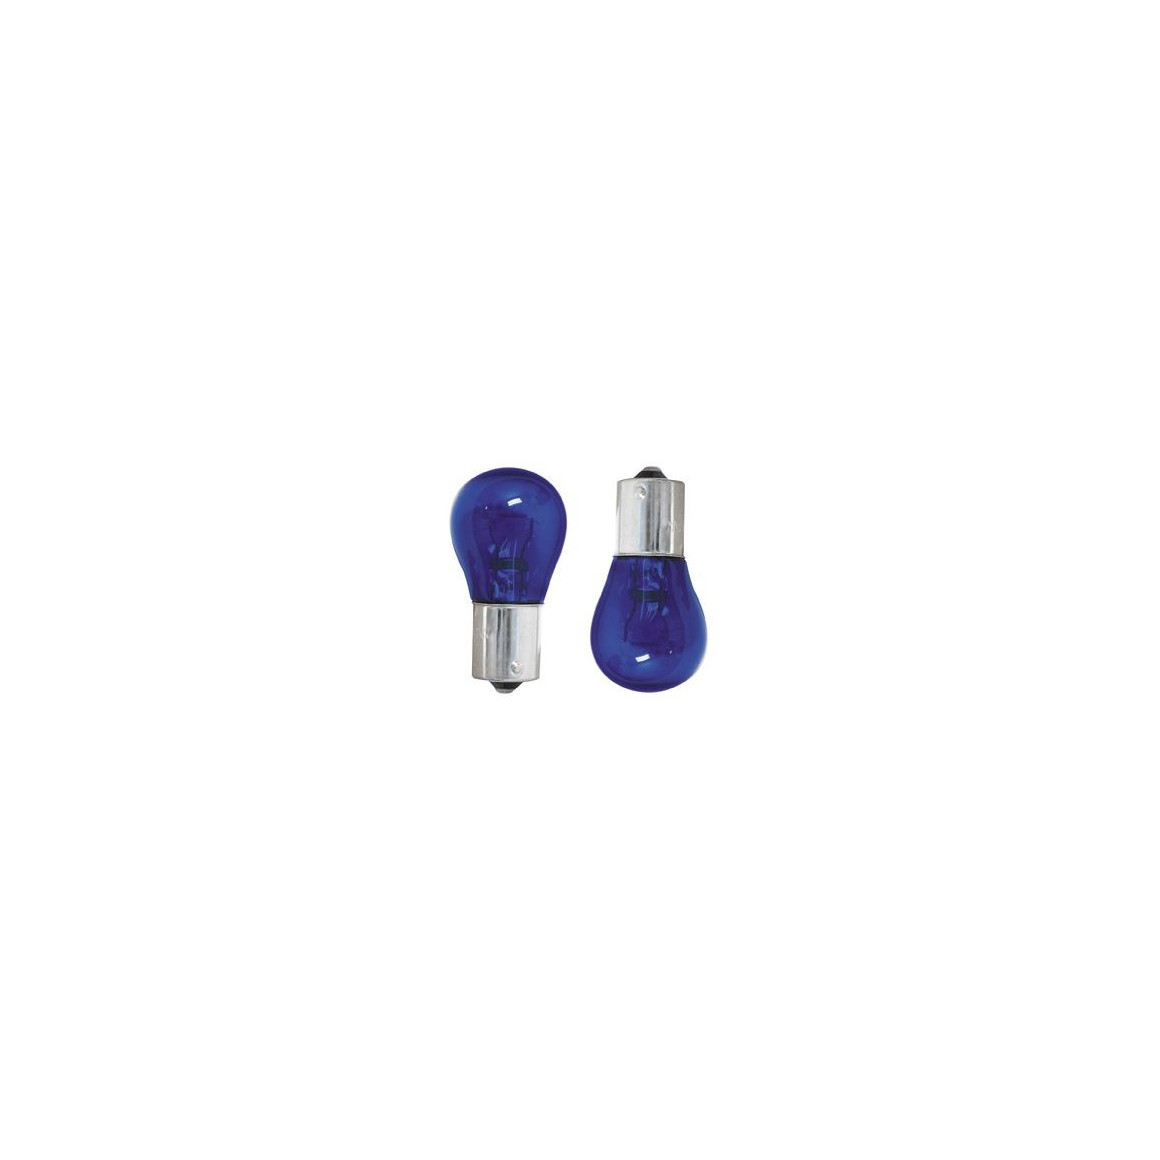 2 x Bulbs BlueVision P21W - Ergots BA15S